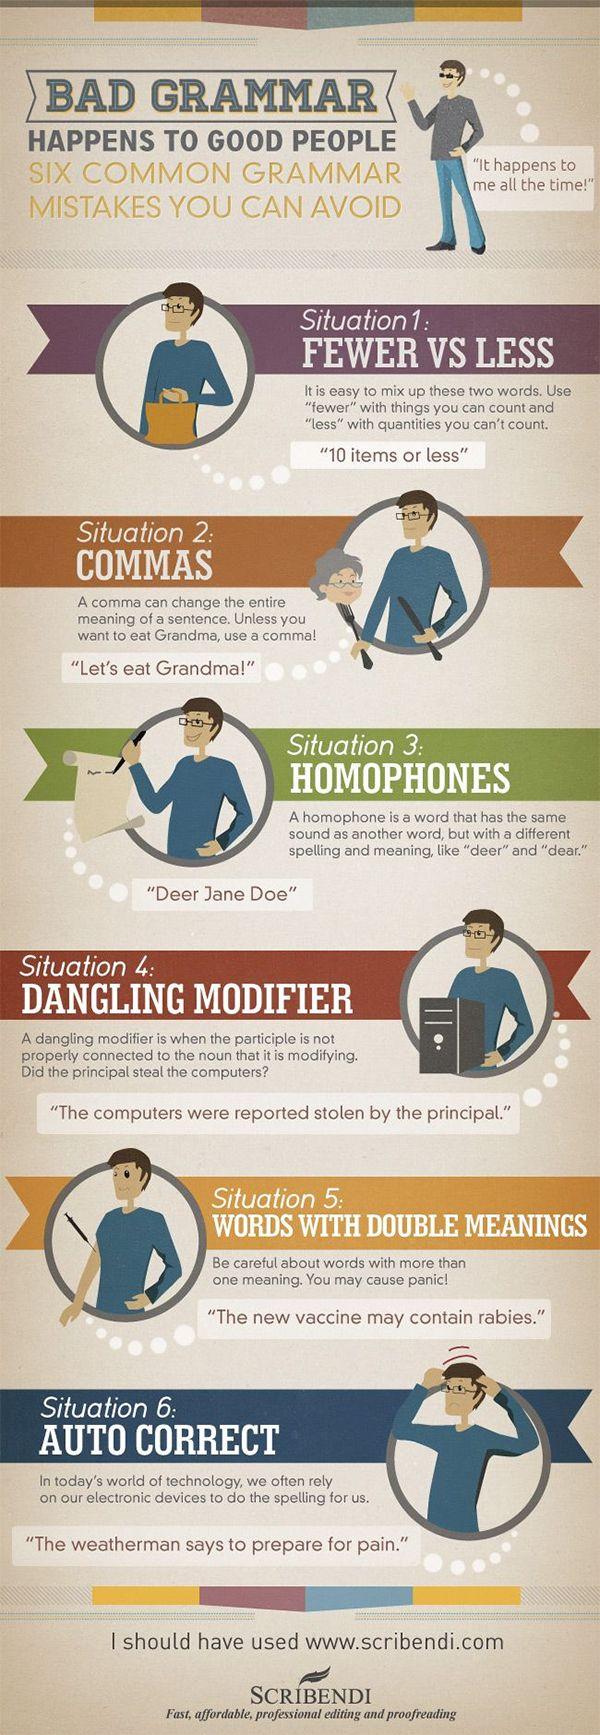 Bad Grammar Happens to Good People   #infographic #Grammar #English